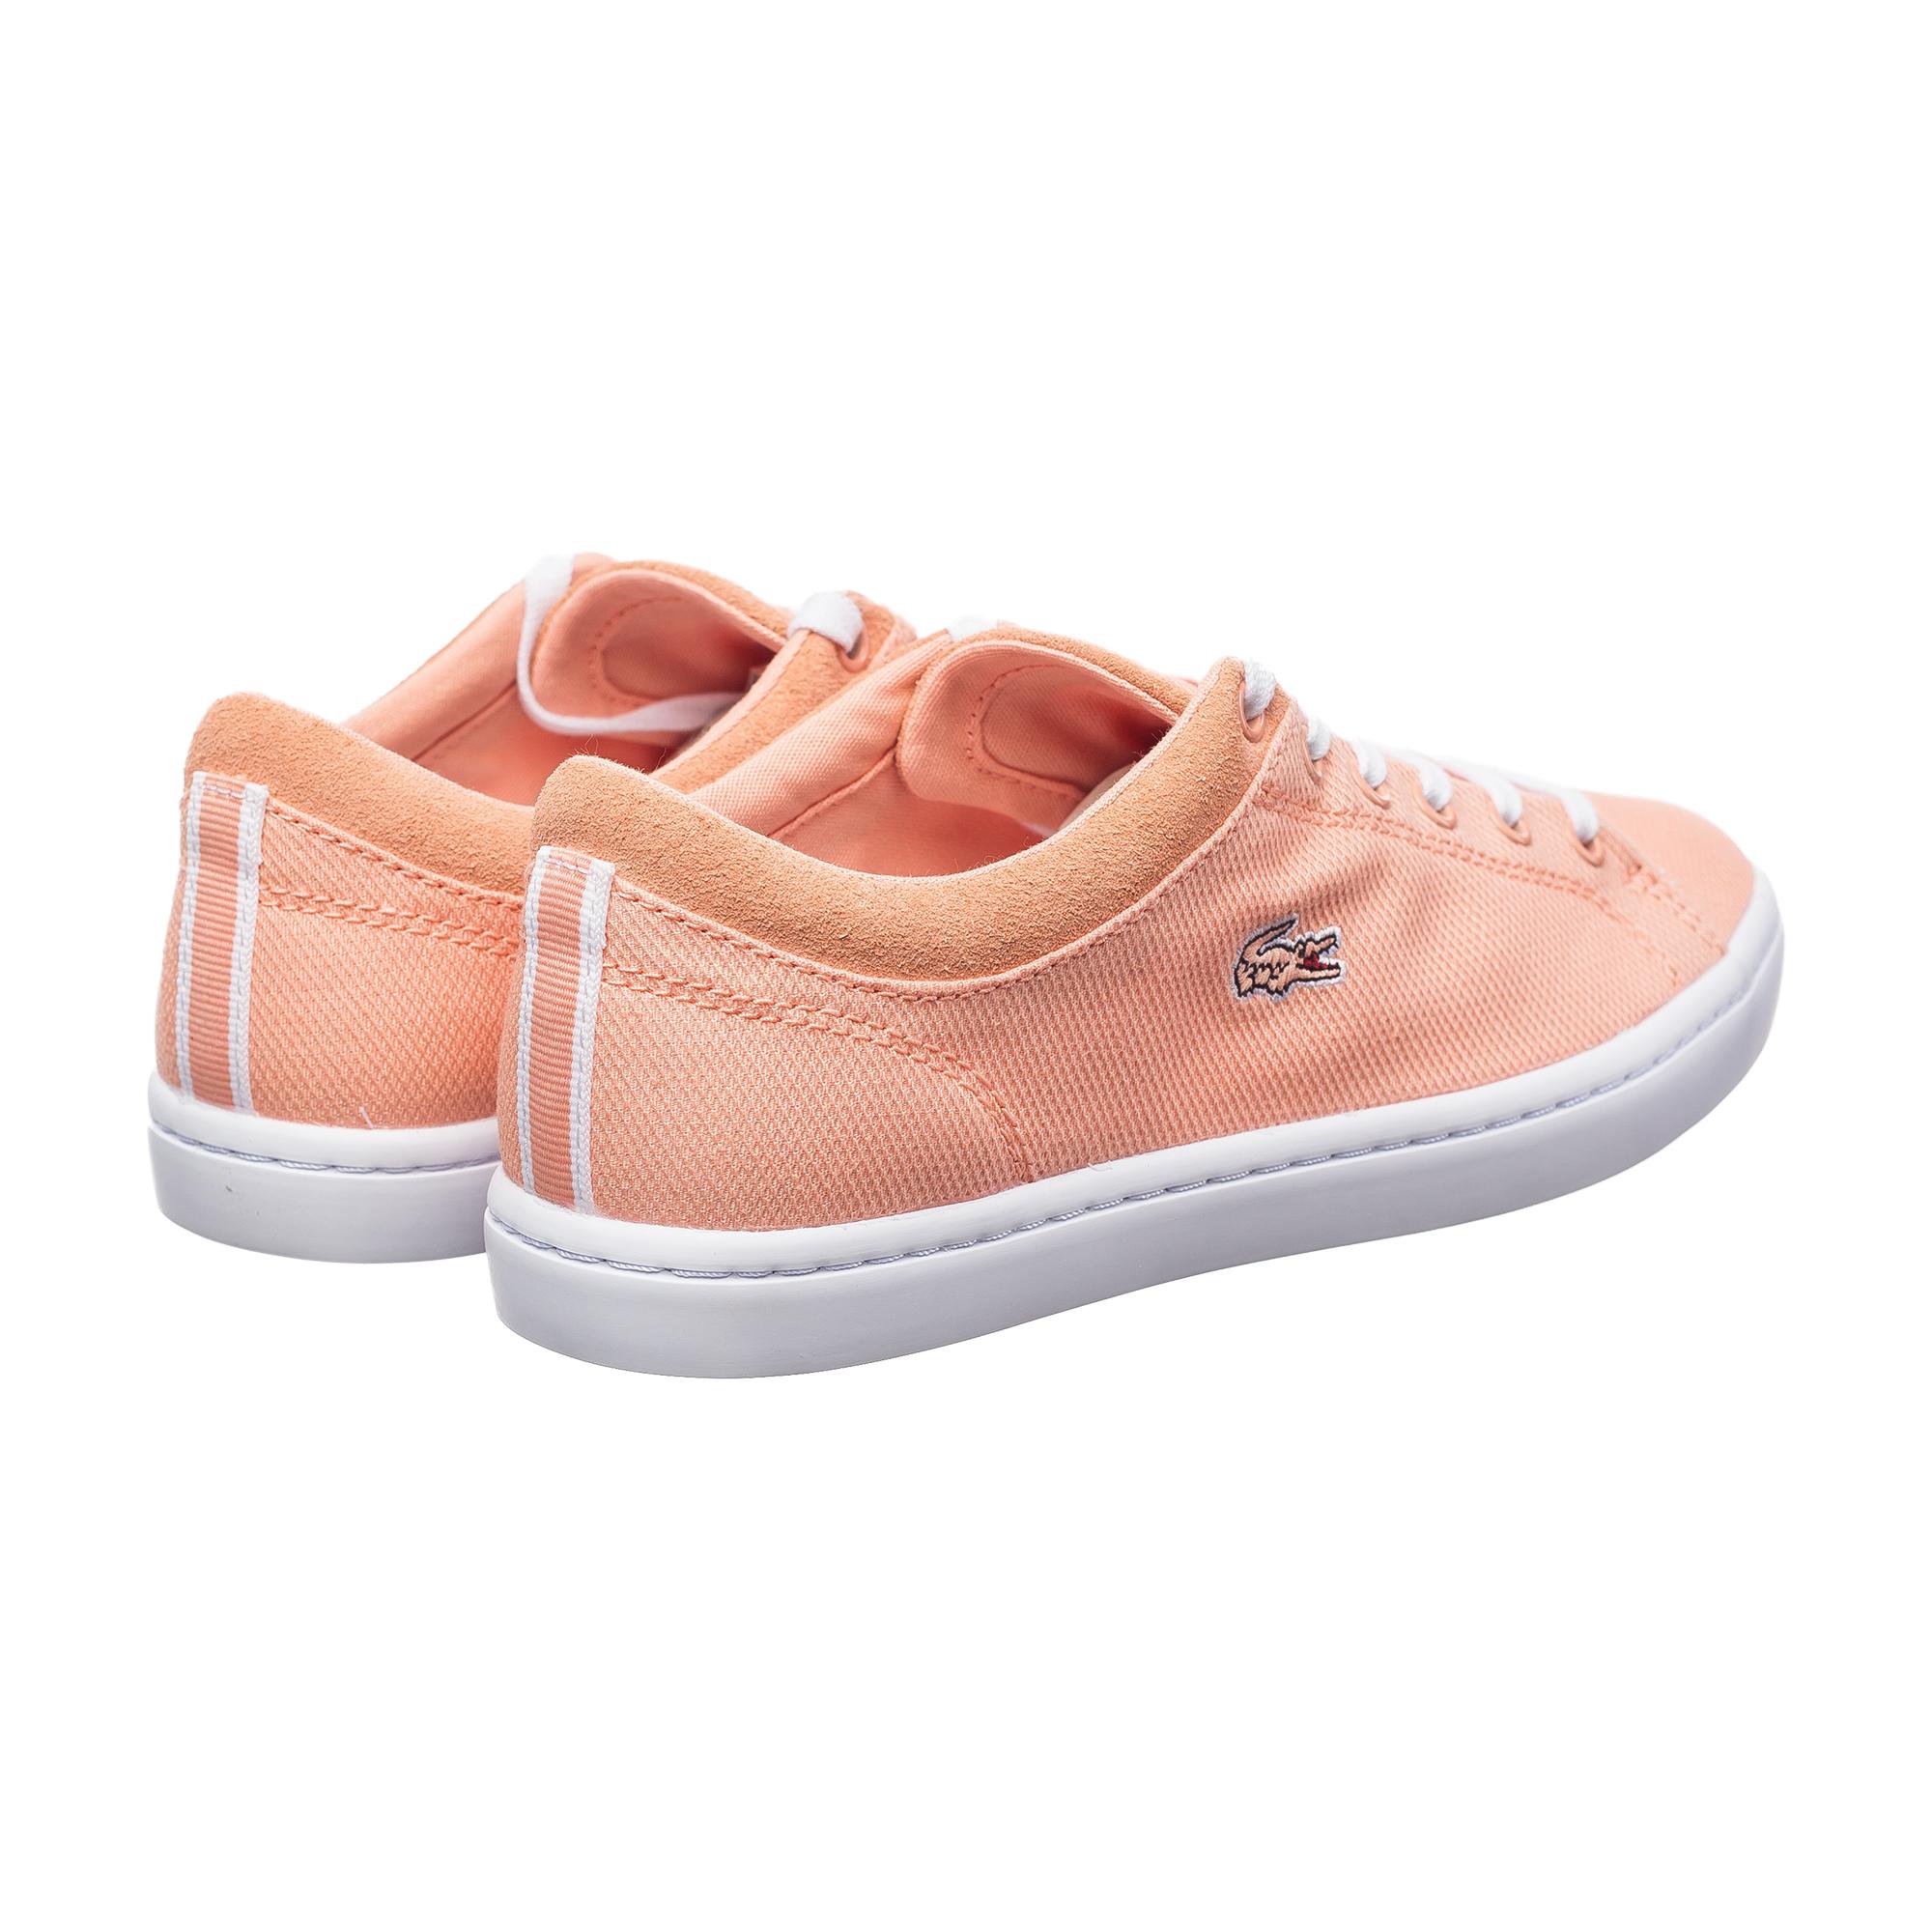 Фото 3 - Straightset 116 2 от Lacoste персикового цвета